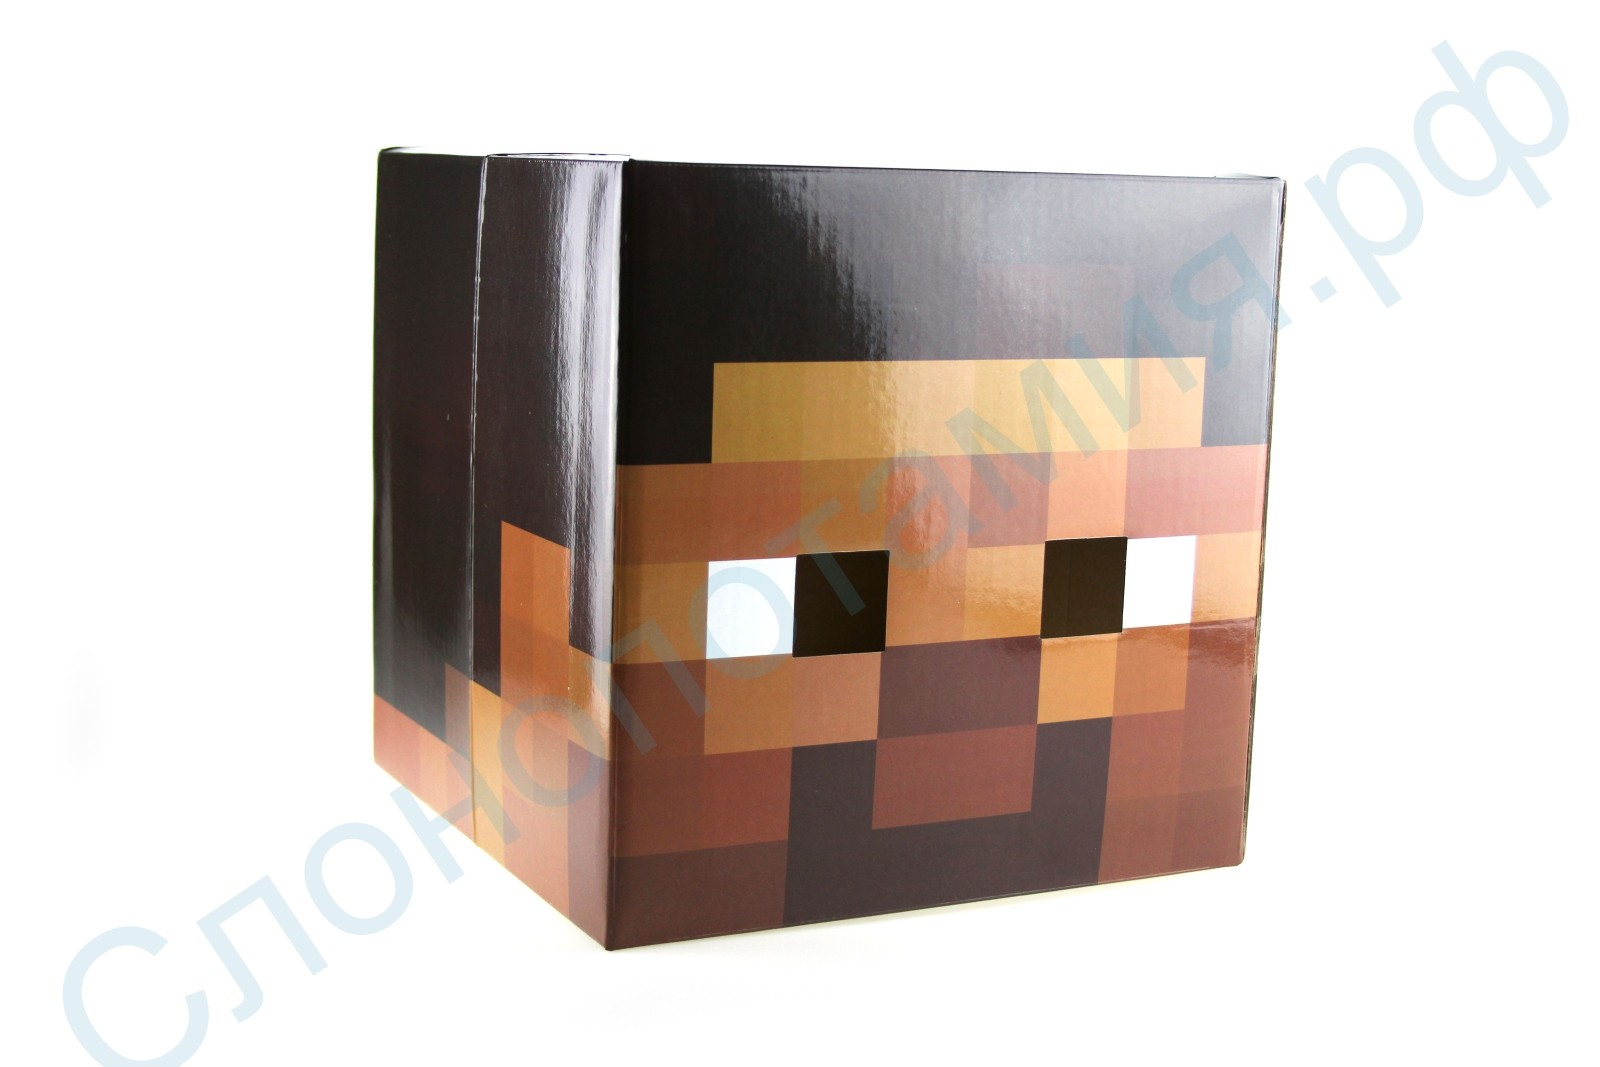 Картонная маска Steave Head из Майнкрафт